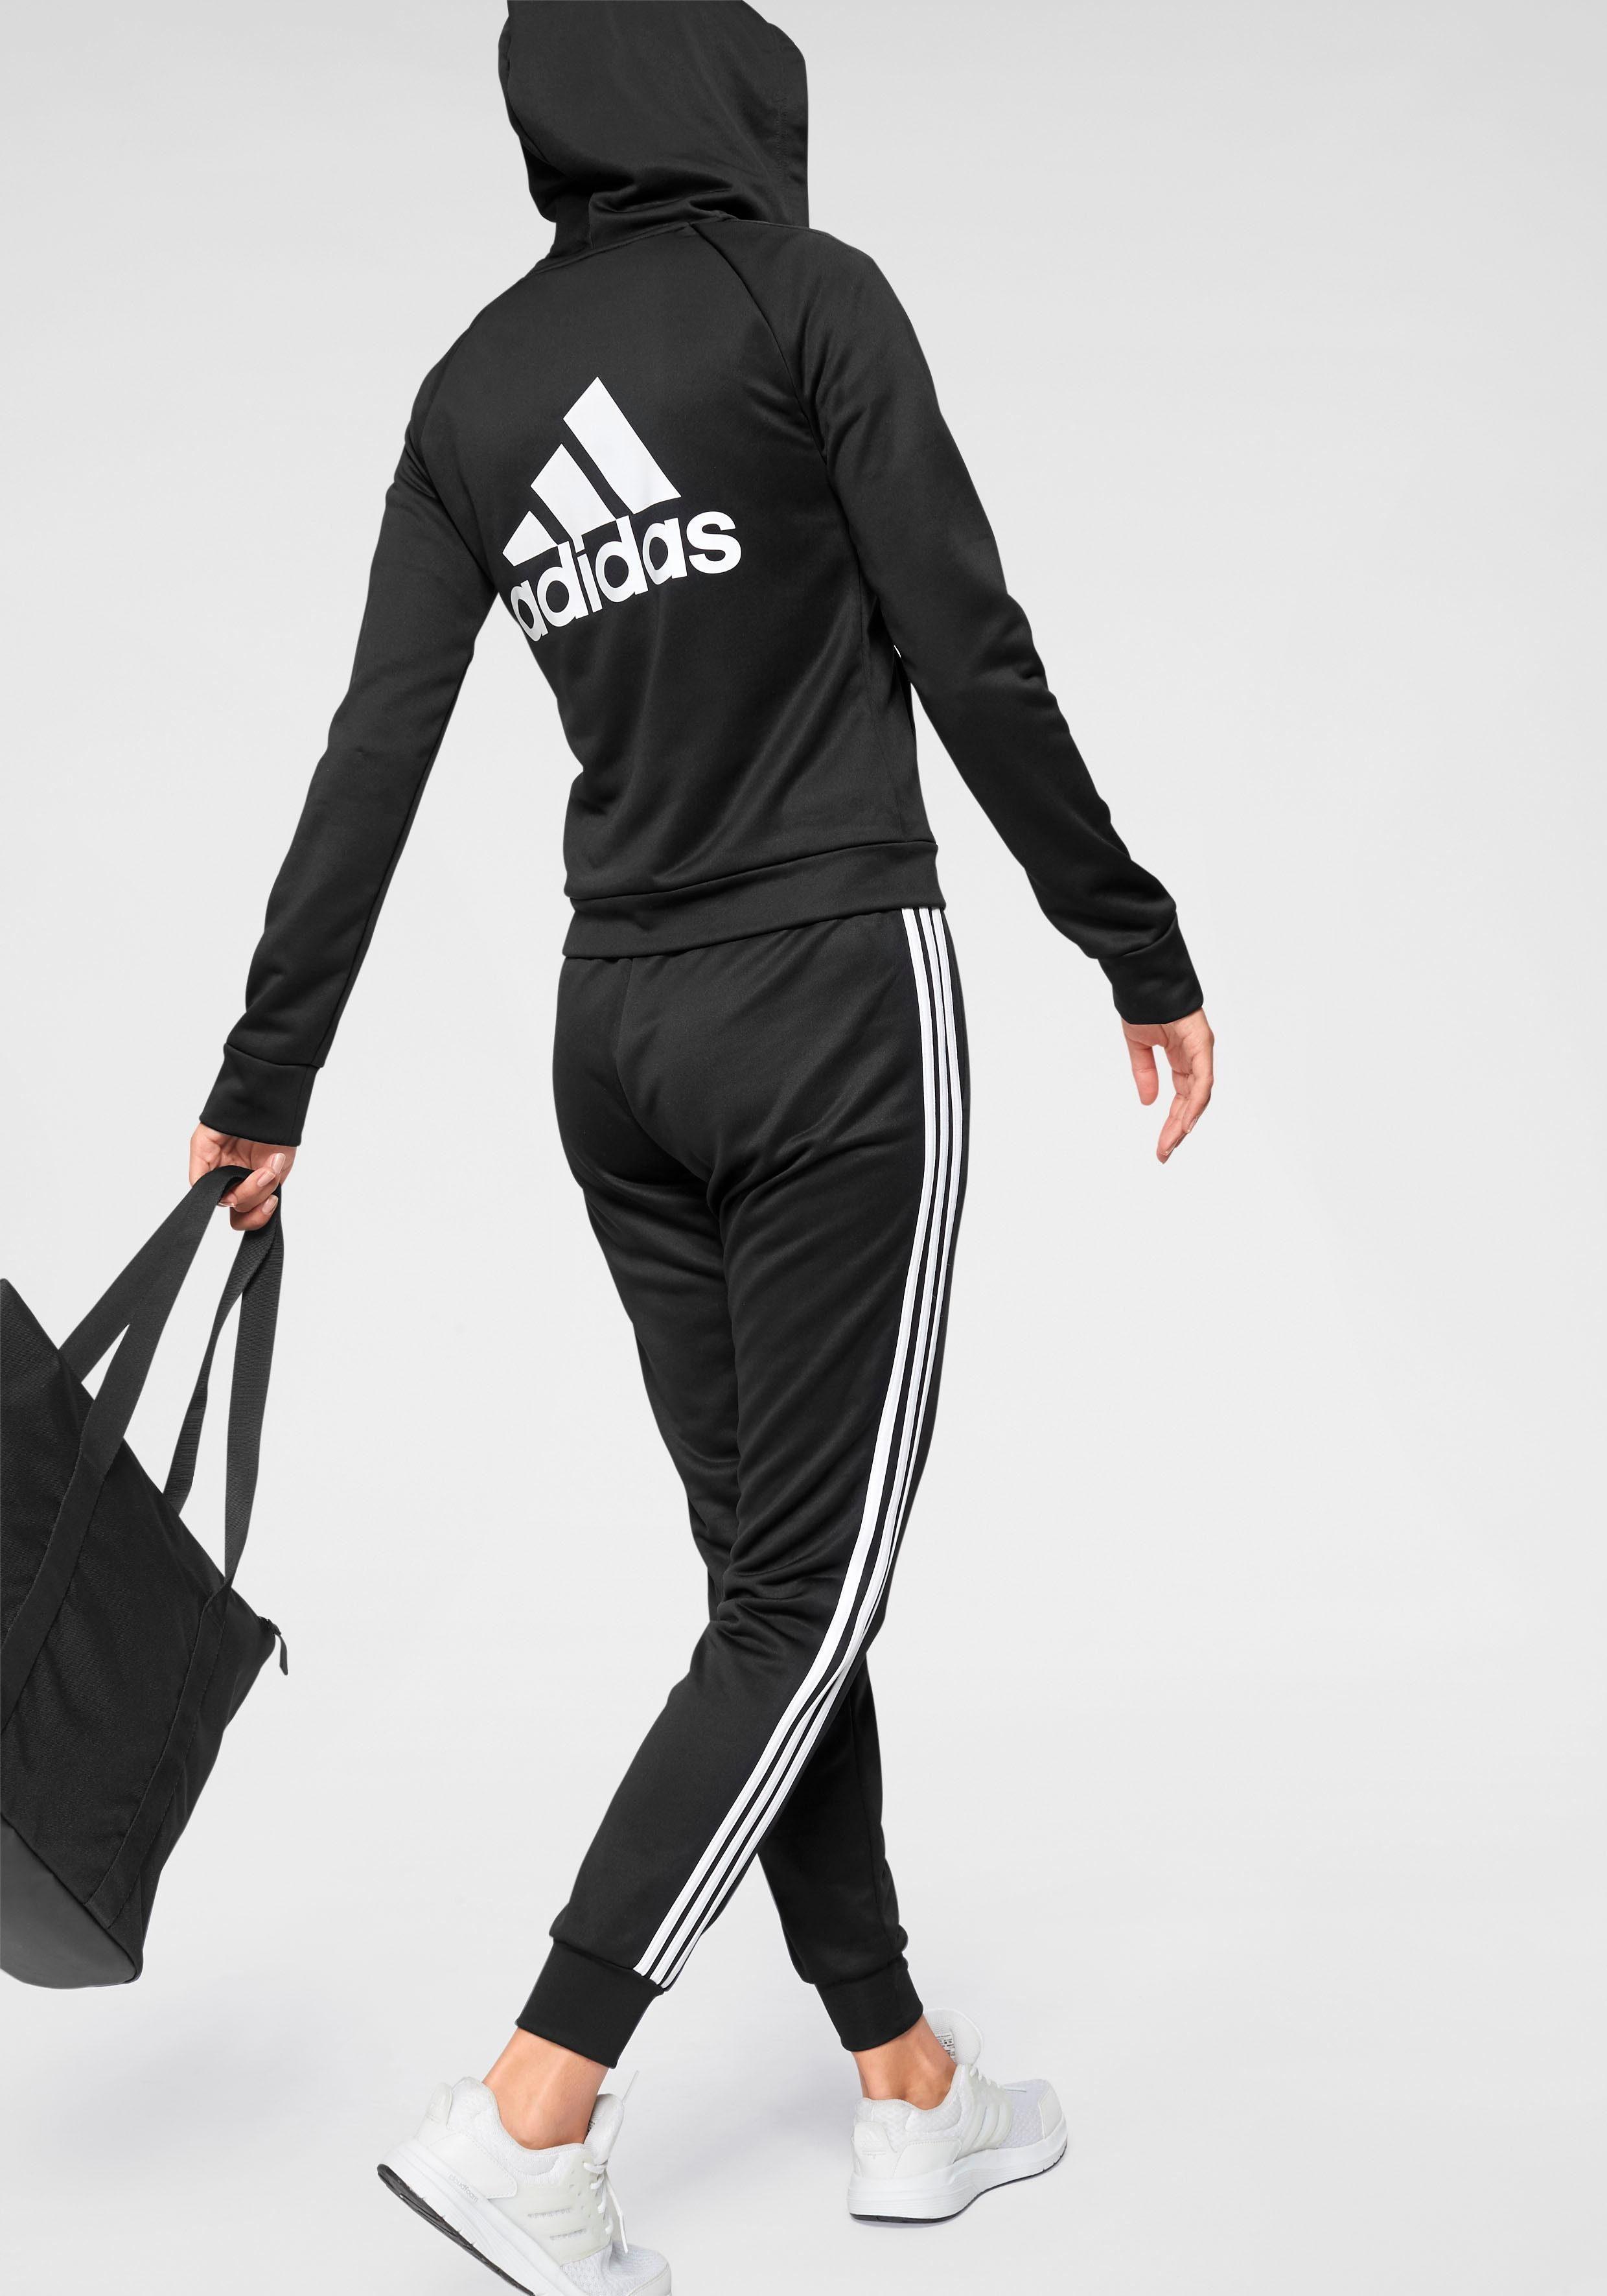 472fecf3dd adidas trainingspak dames - sanrafaelenvivo.com